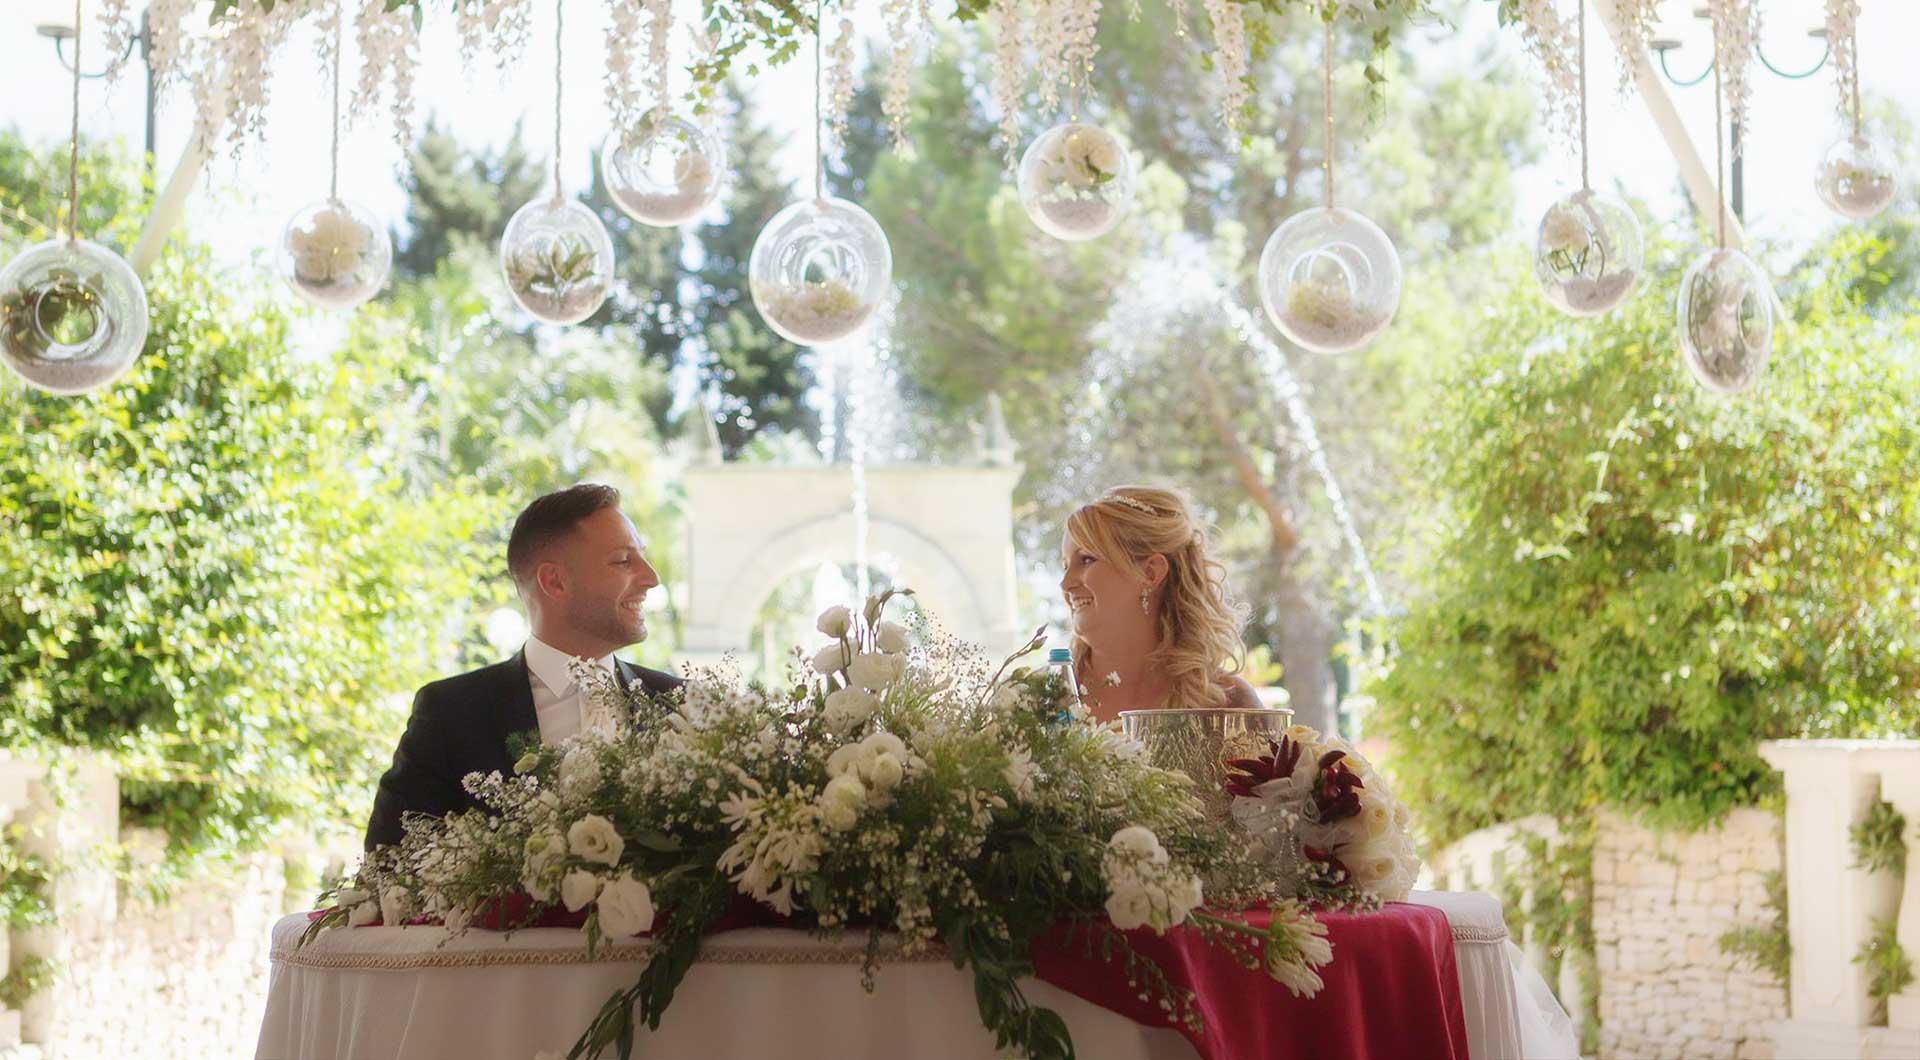 matrimonio-giorno-donna-sandra-ricevimenti